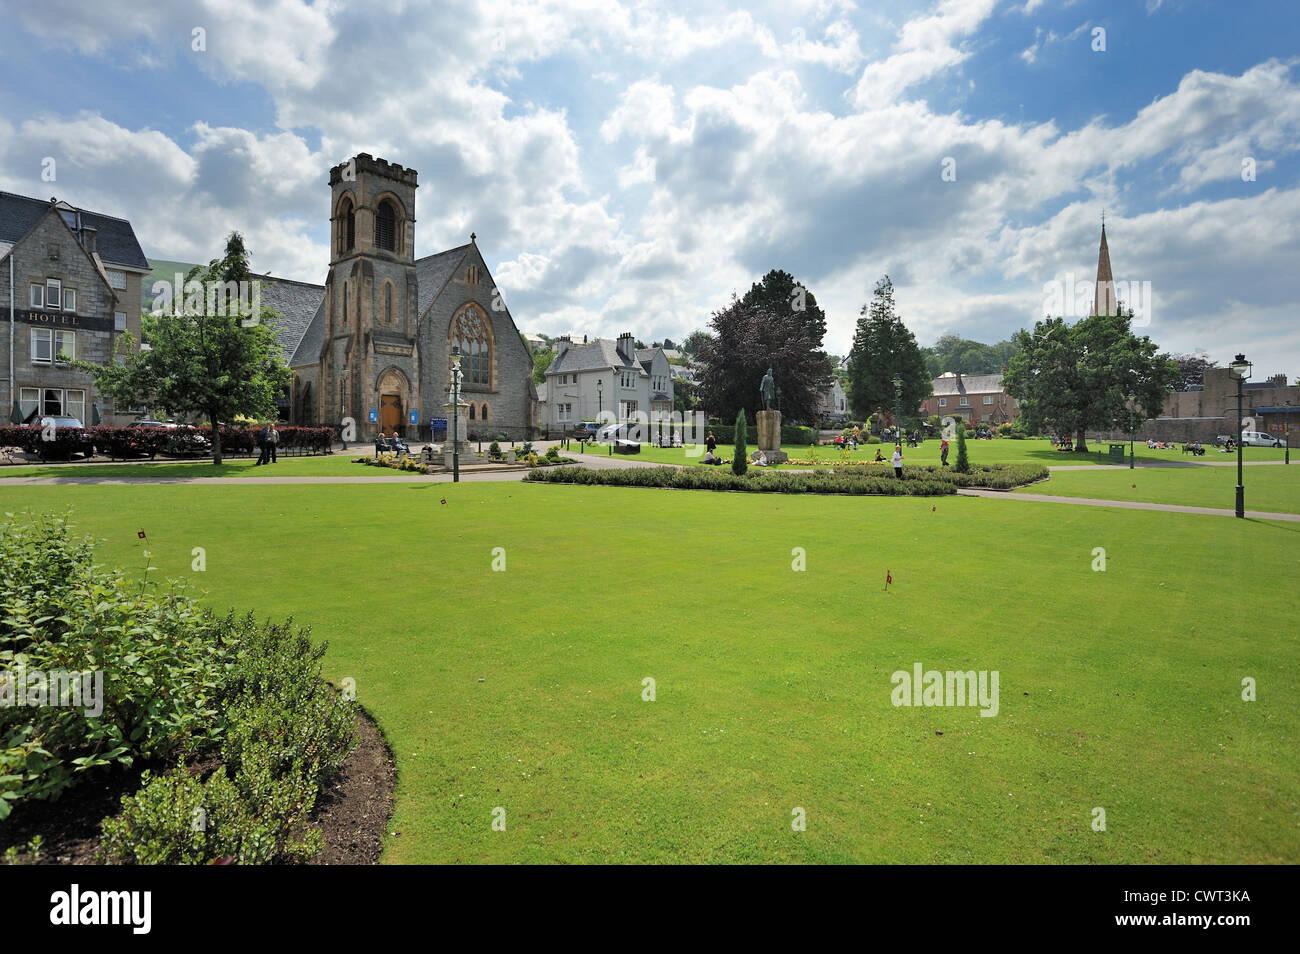 Fort William town square Stock Photo